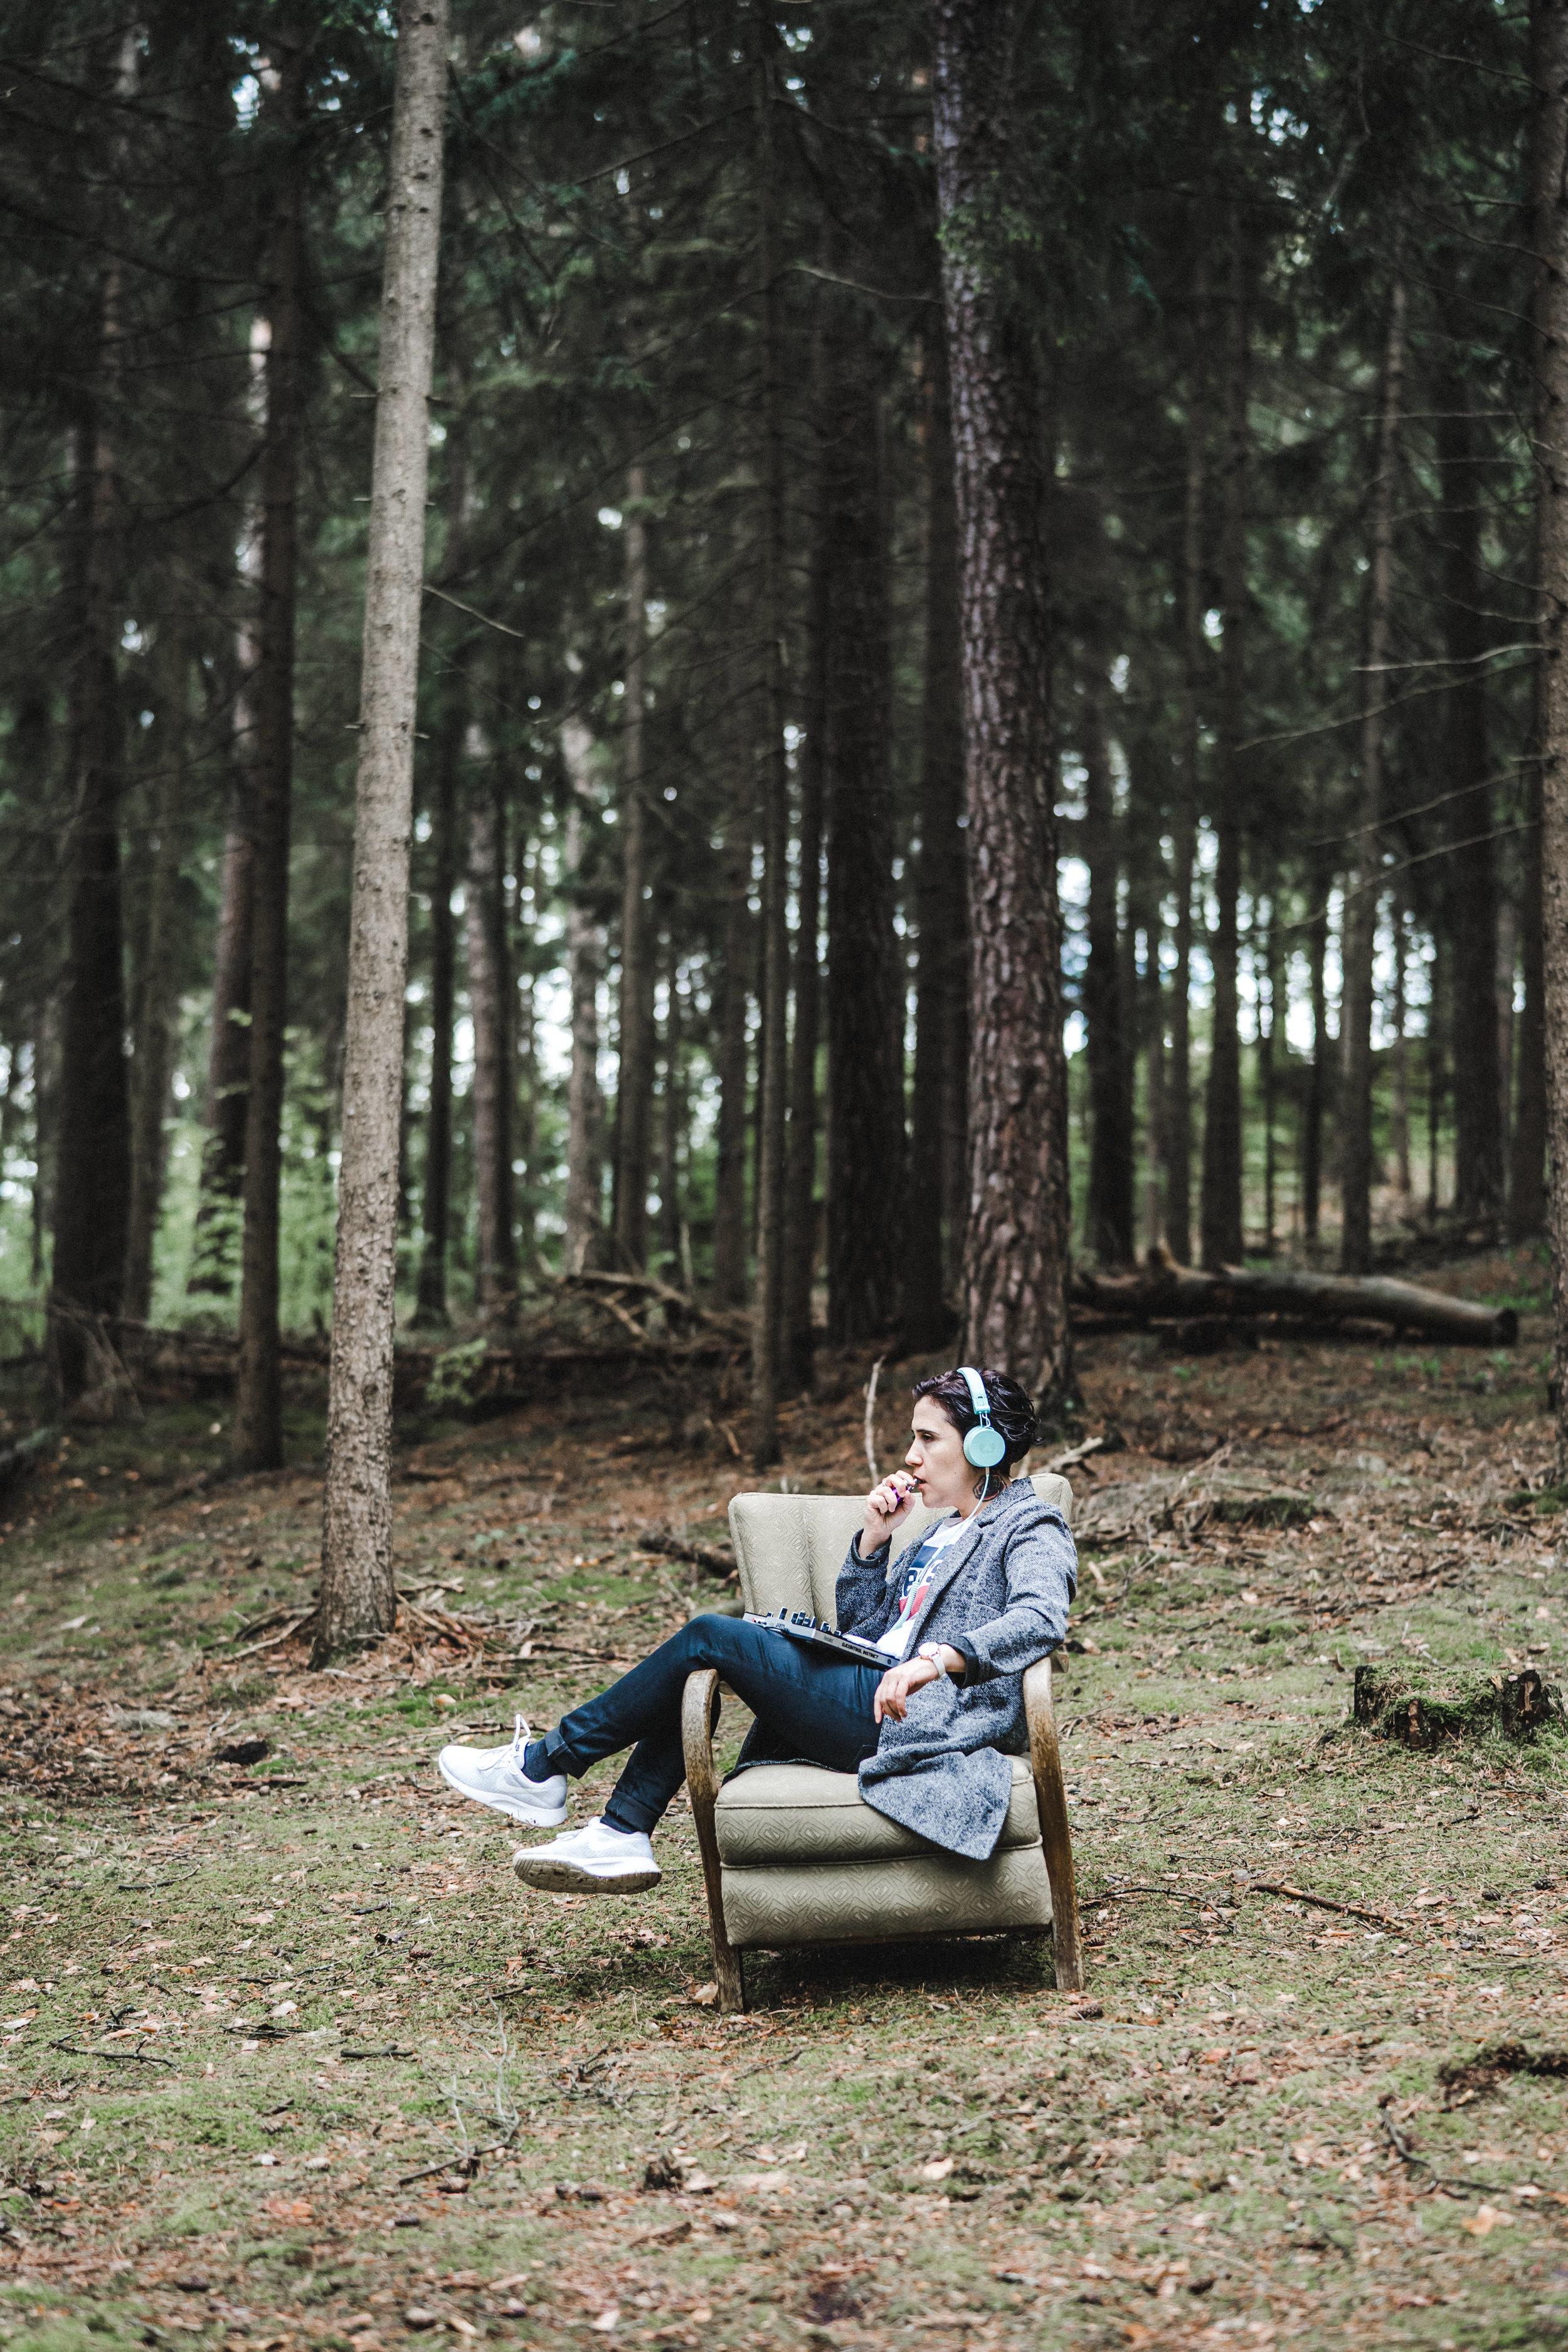 yessica-baur-fotografie-portrait-tuebingen-0151-9535.jpg